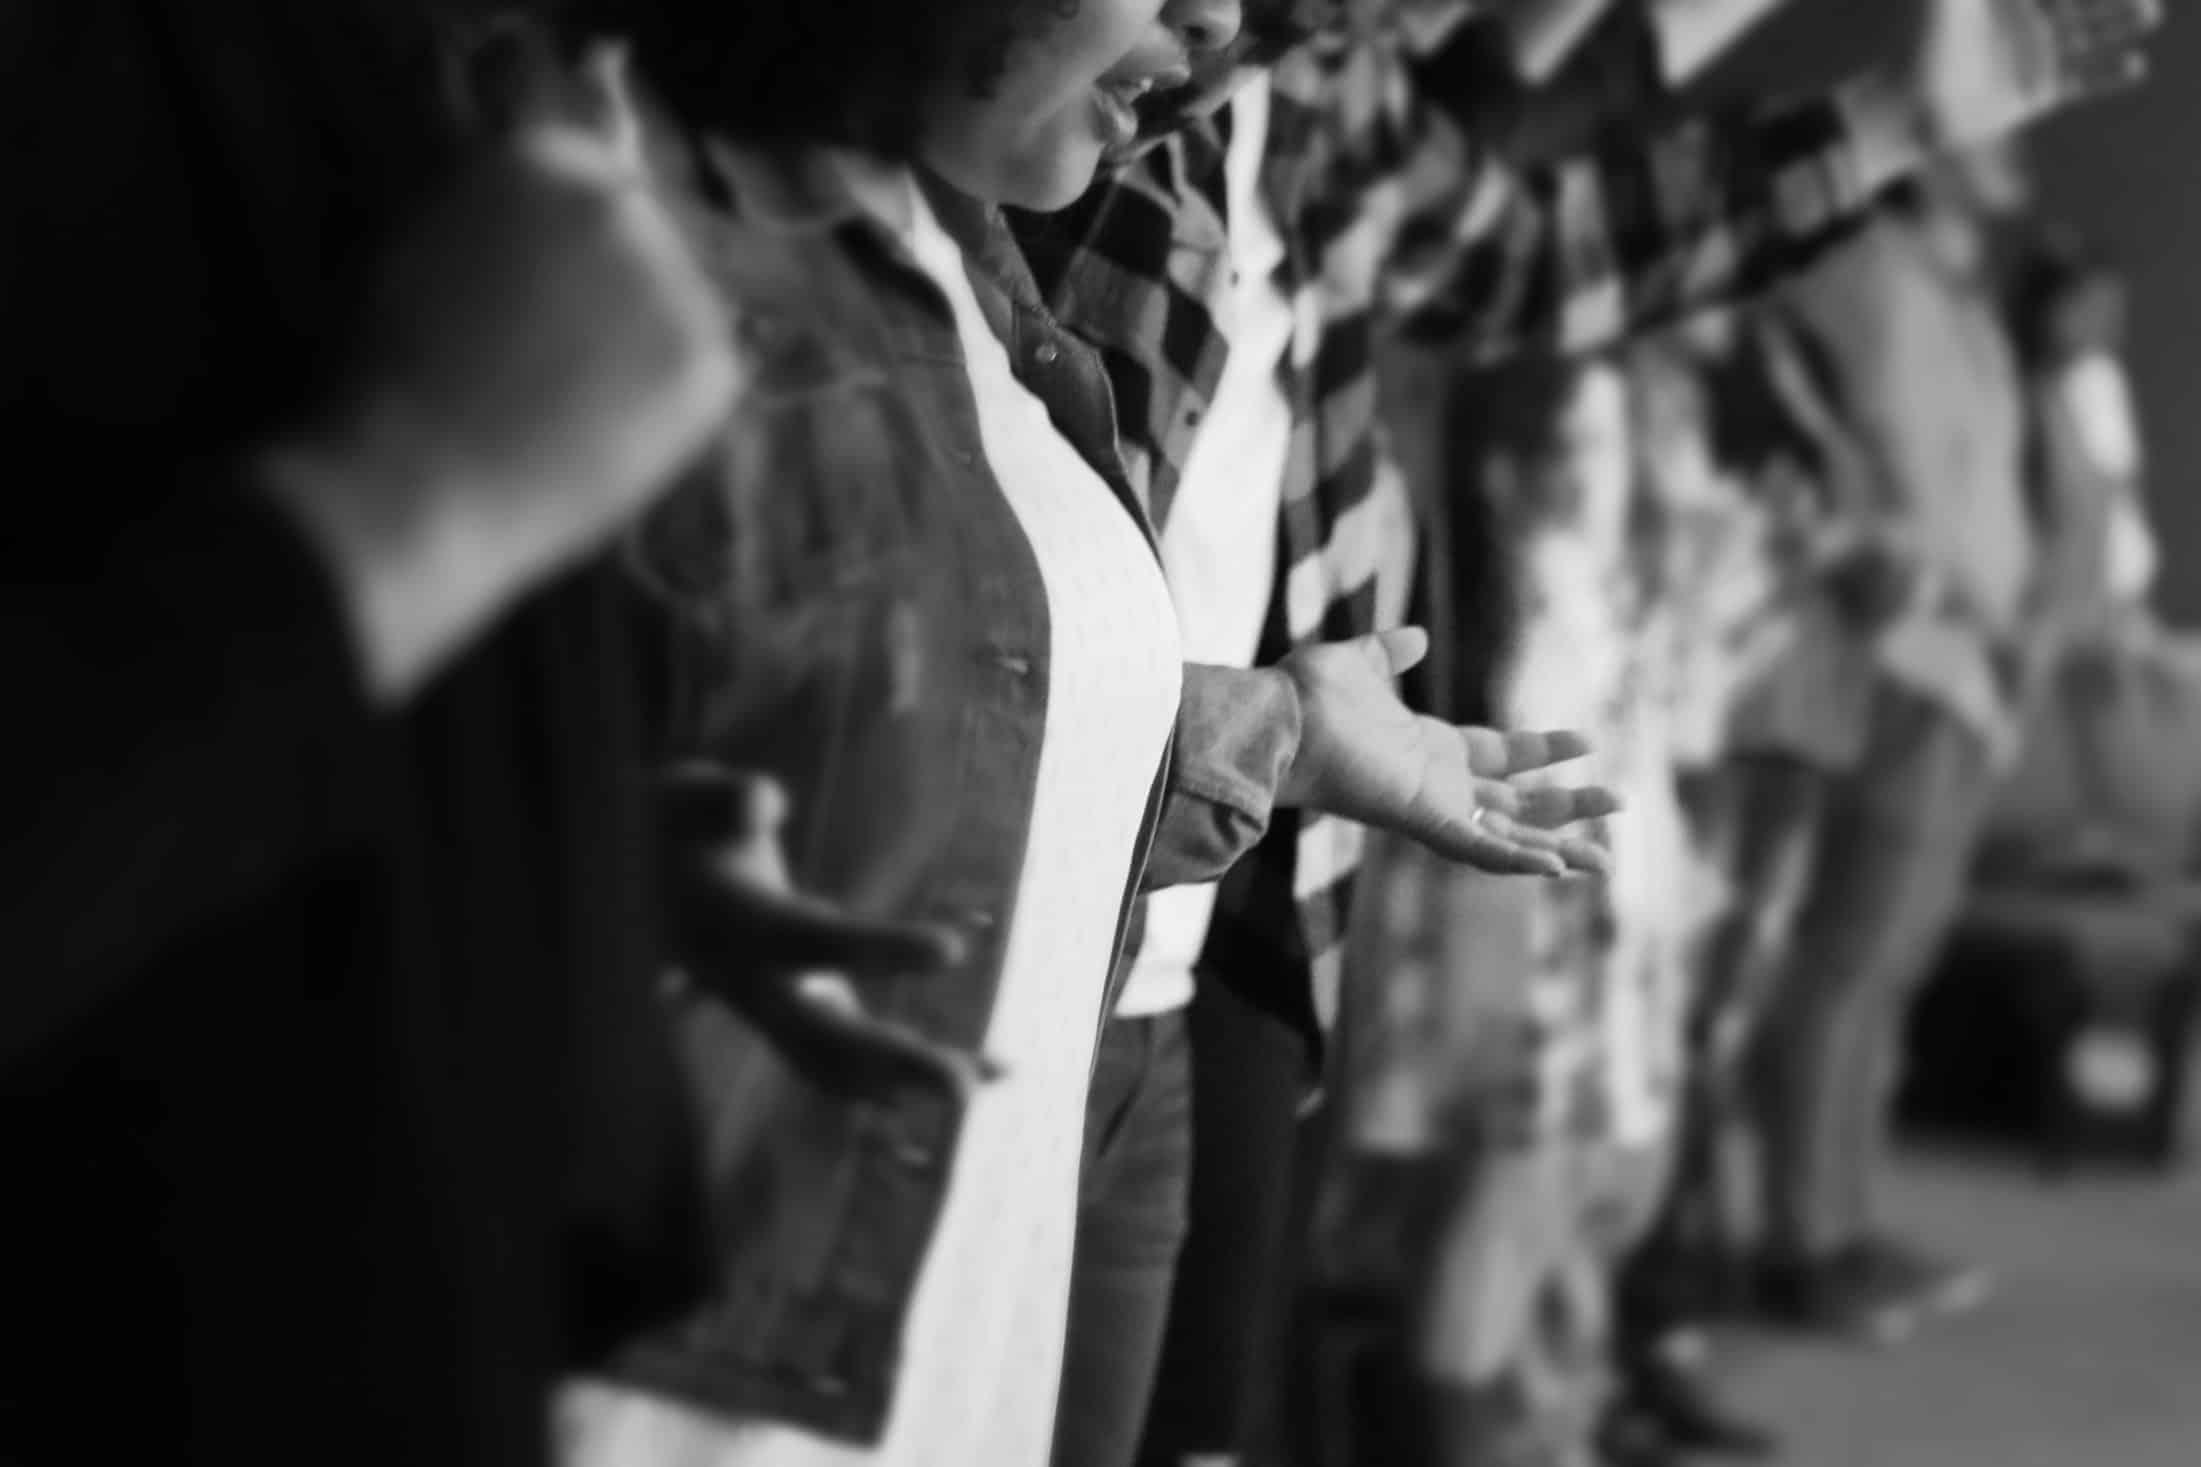 People praying photo - eucharistic prayer